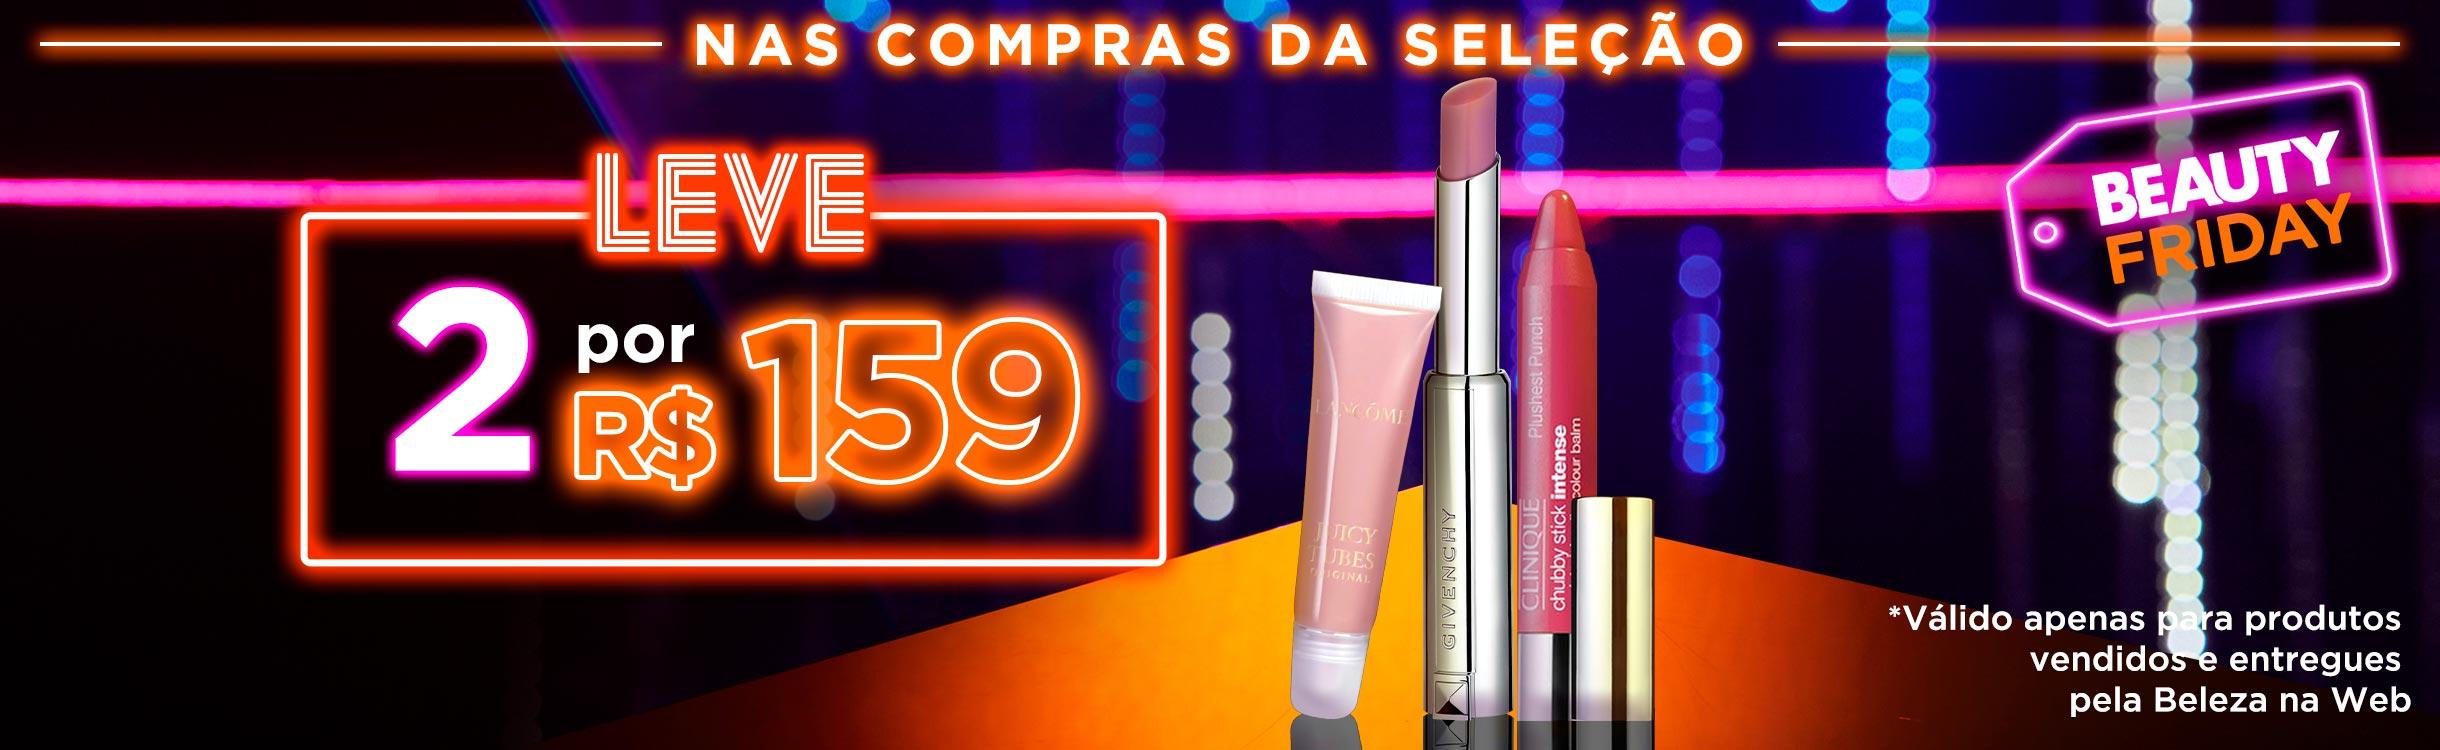 Beauty Week | Leve 2 Batons Desejo e Pague Apenas R$159